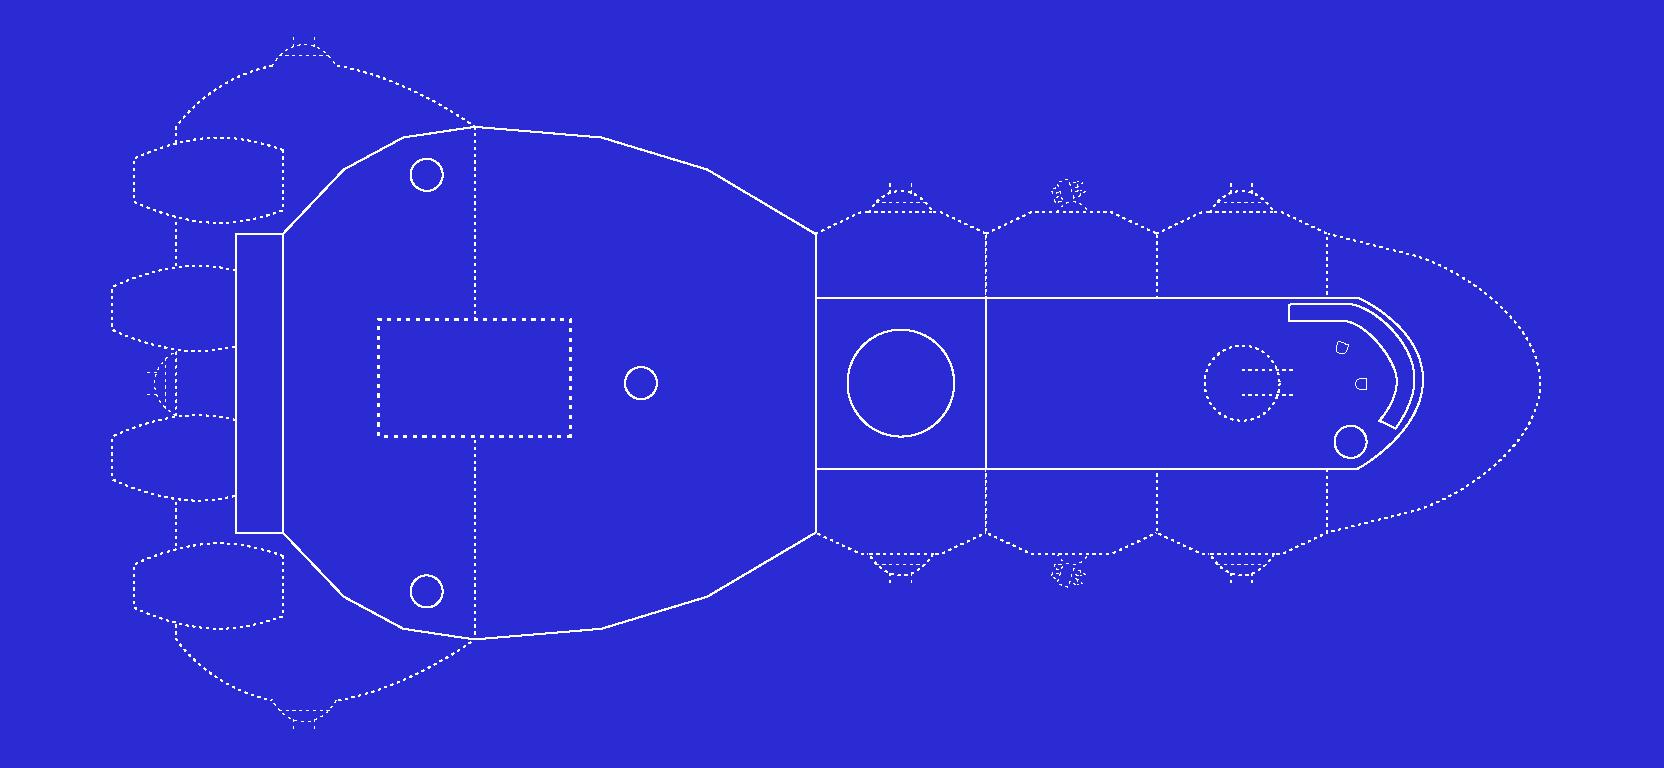 Spaceship blueprint L1